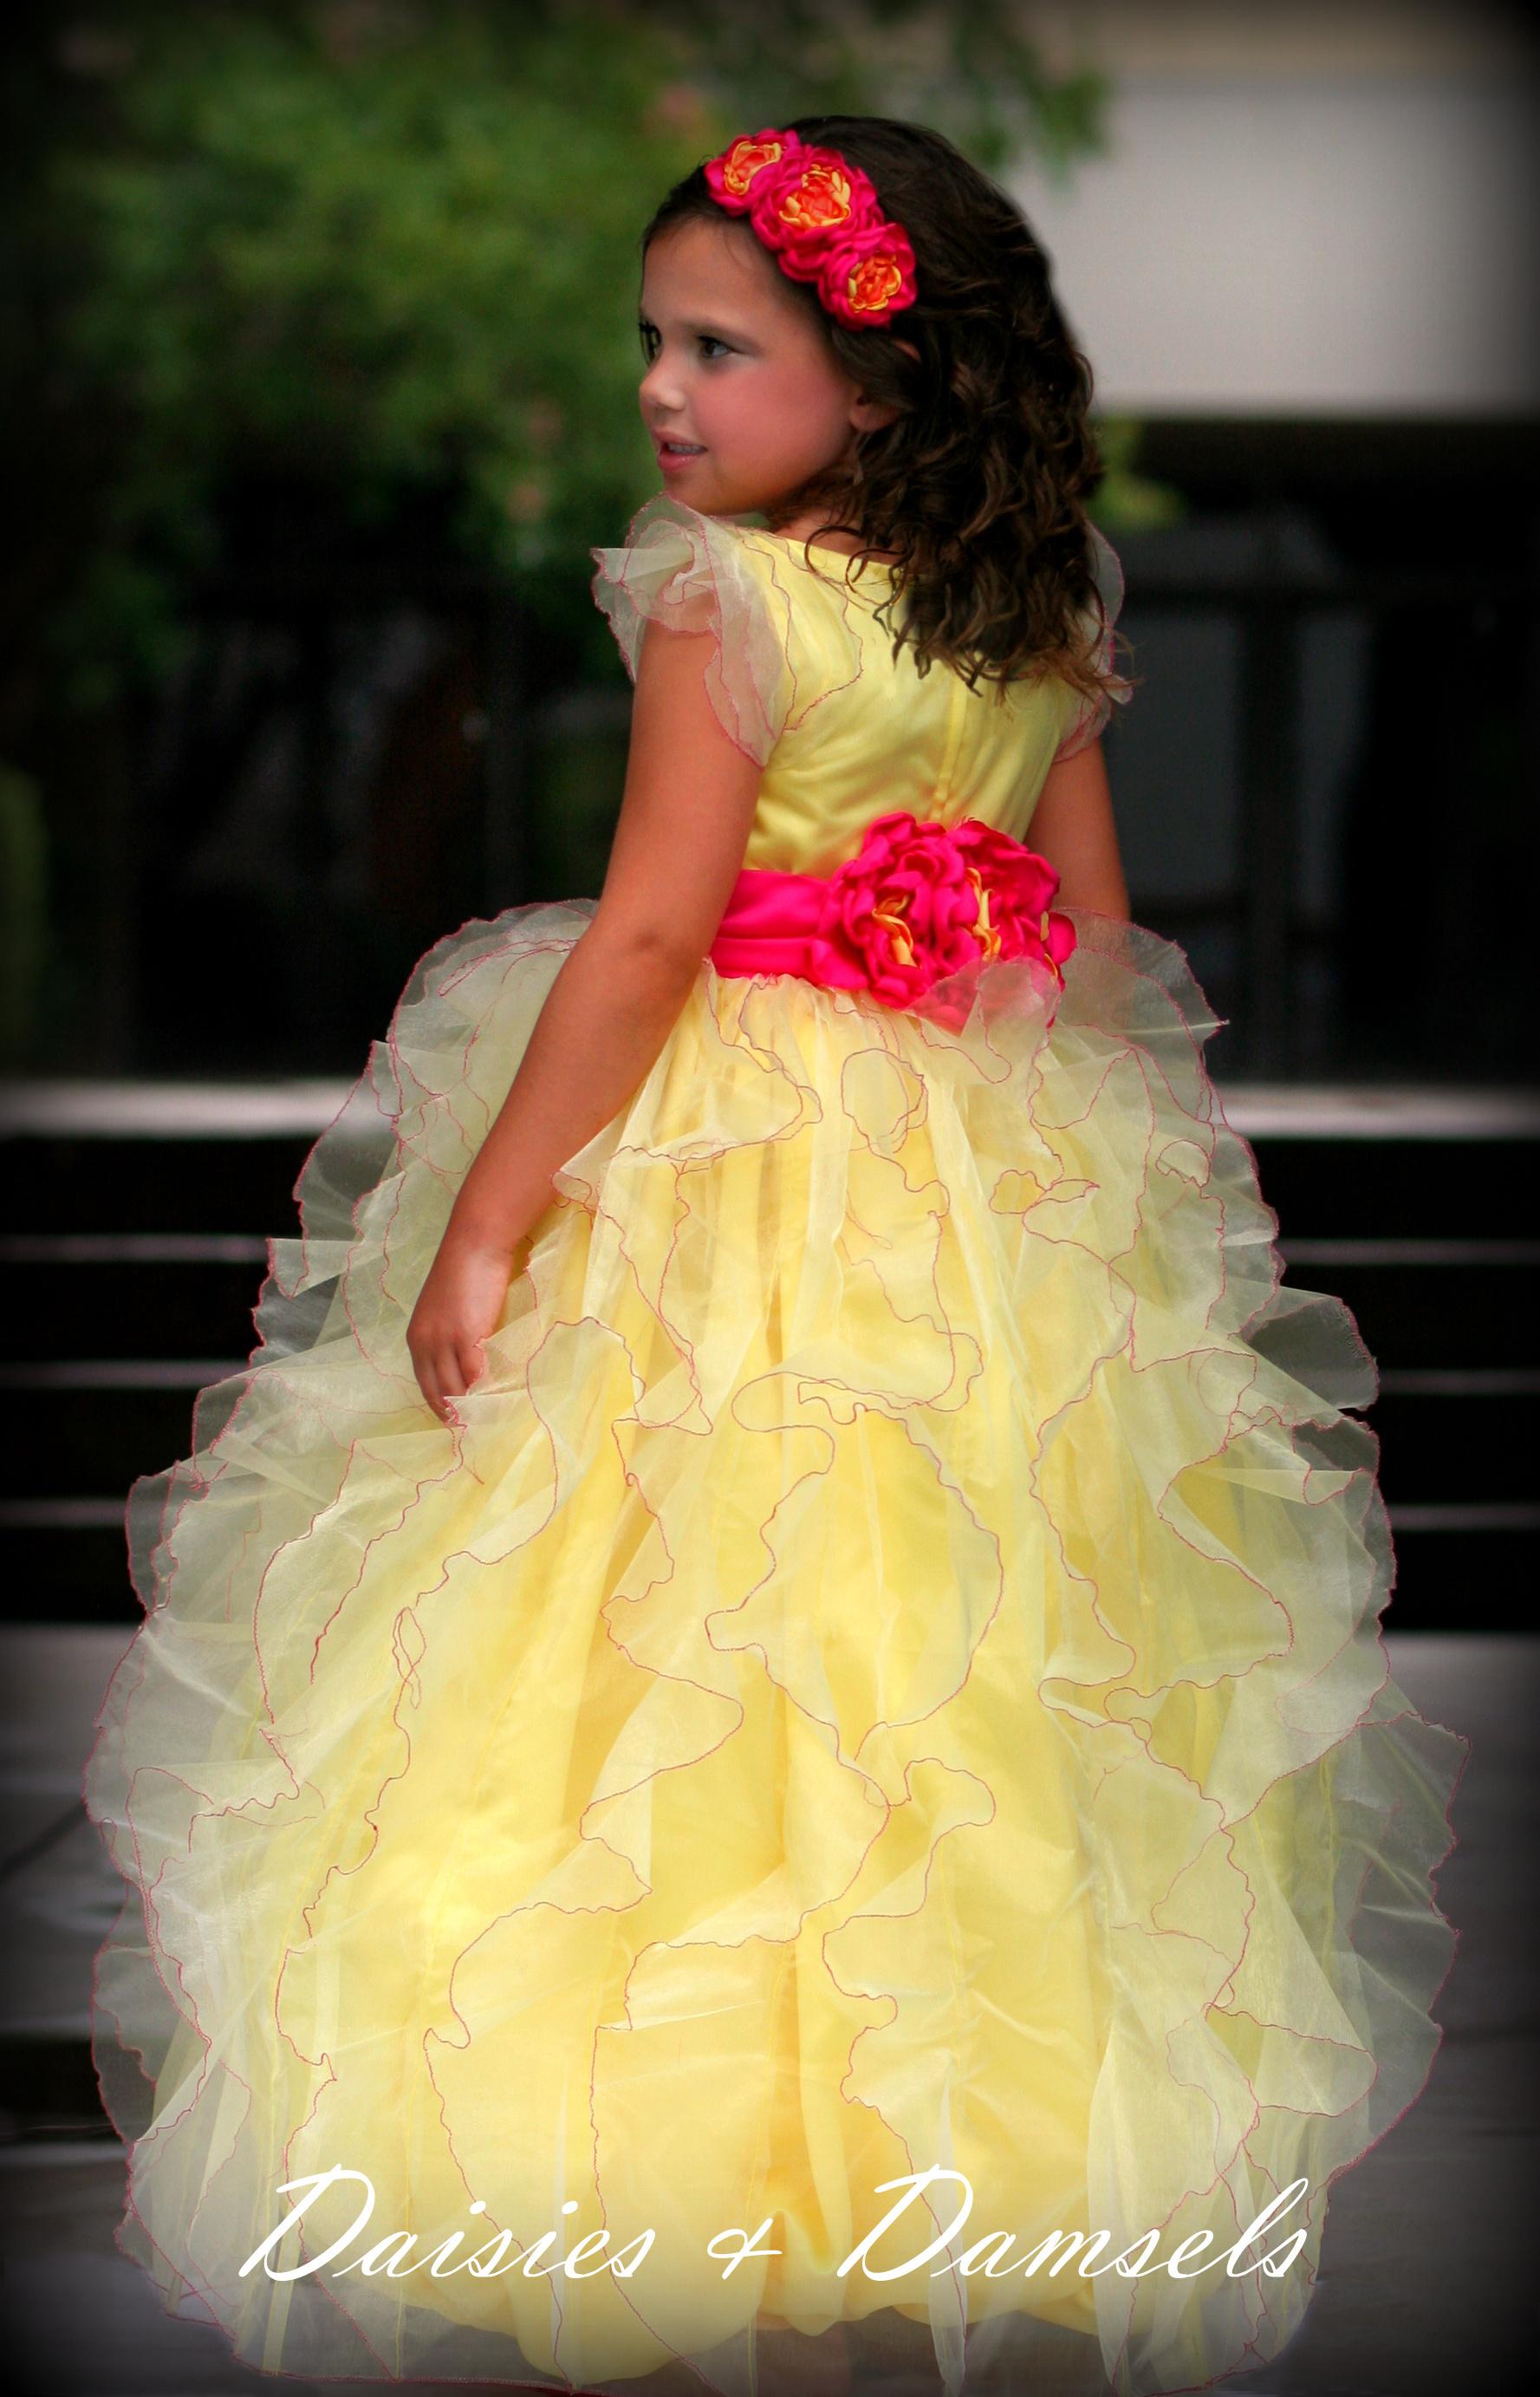 Flowers, Hair, pink, dress, yellow, Flower, Girl, Peonies, Headband, Peony, Fuchsia, Beauty, Headbands, Flowers & Decor, Fashion, Wedding Dresses, Flower Wedding Dresses